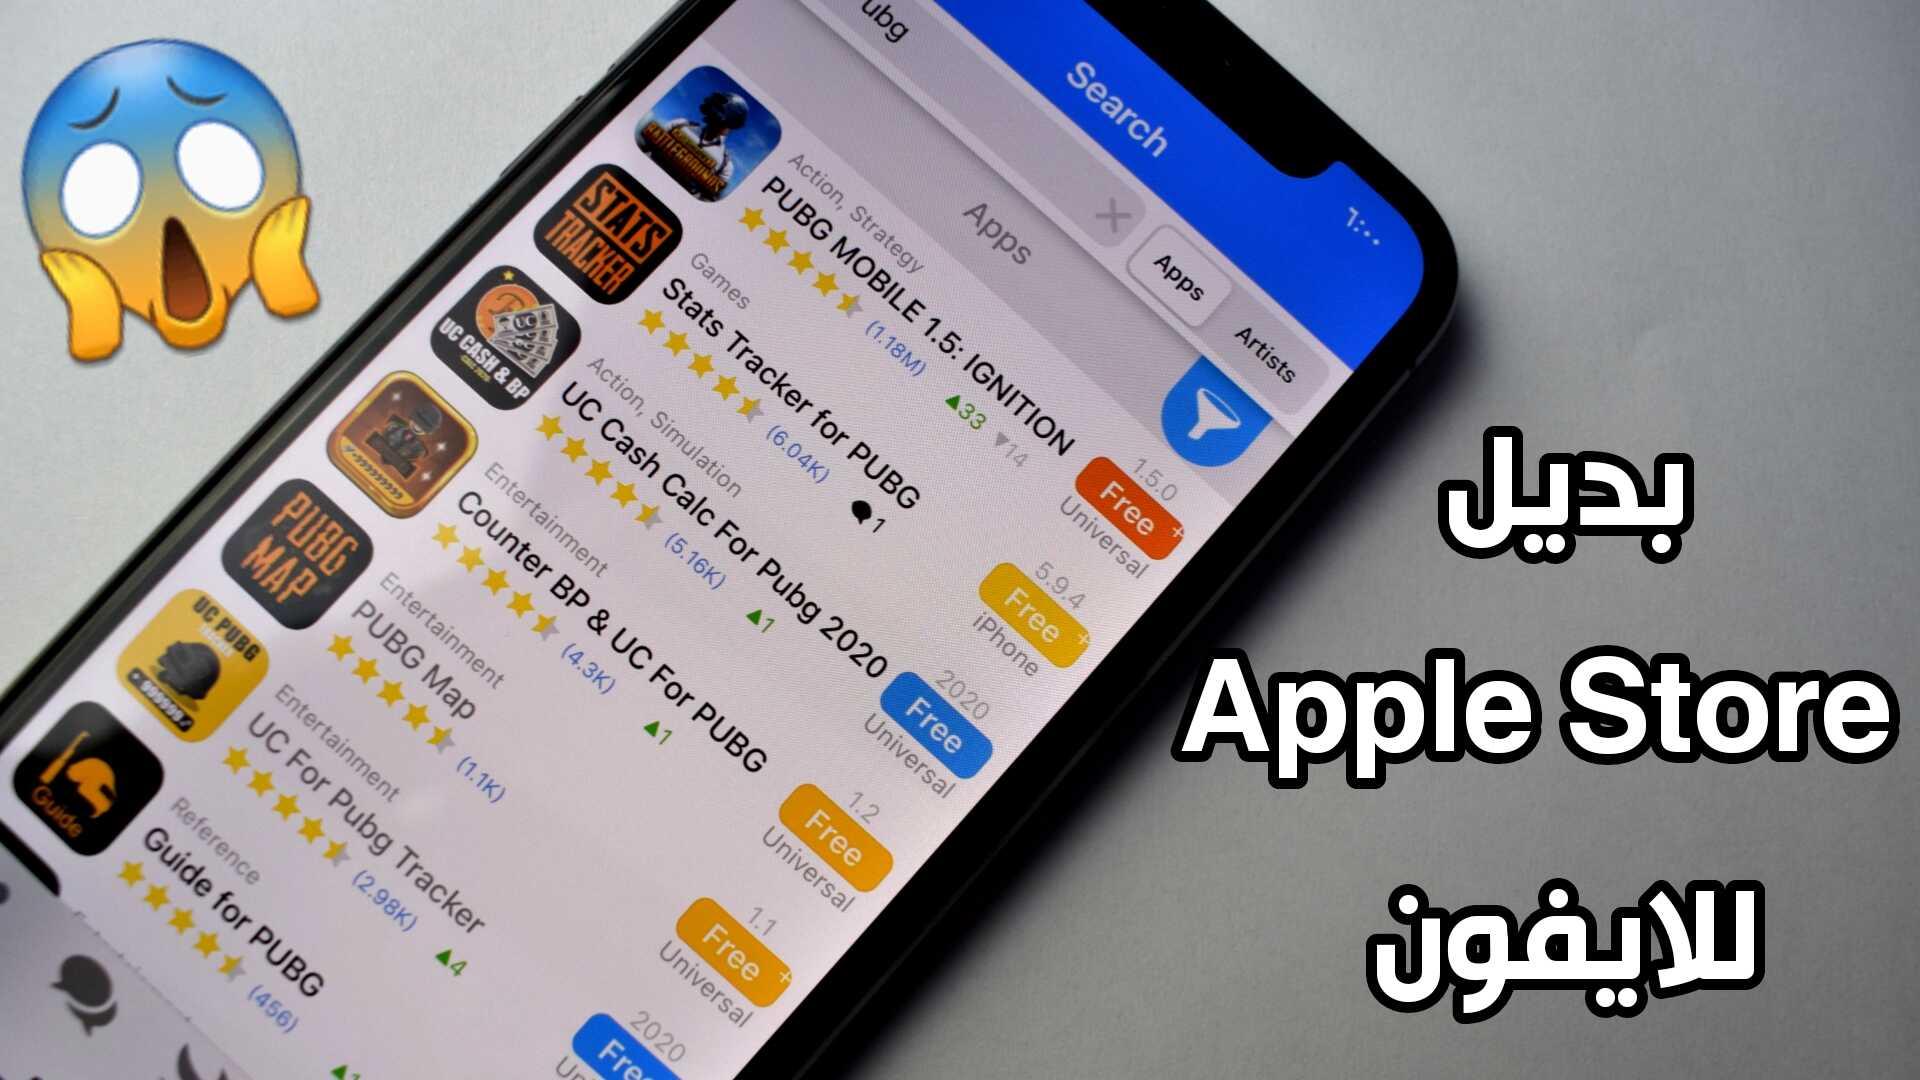 بديل Apple Store للايفون والايباد تطبيقات والعاب بدون جيلبريك